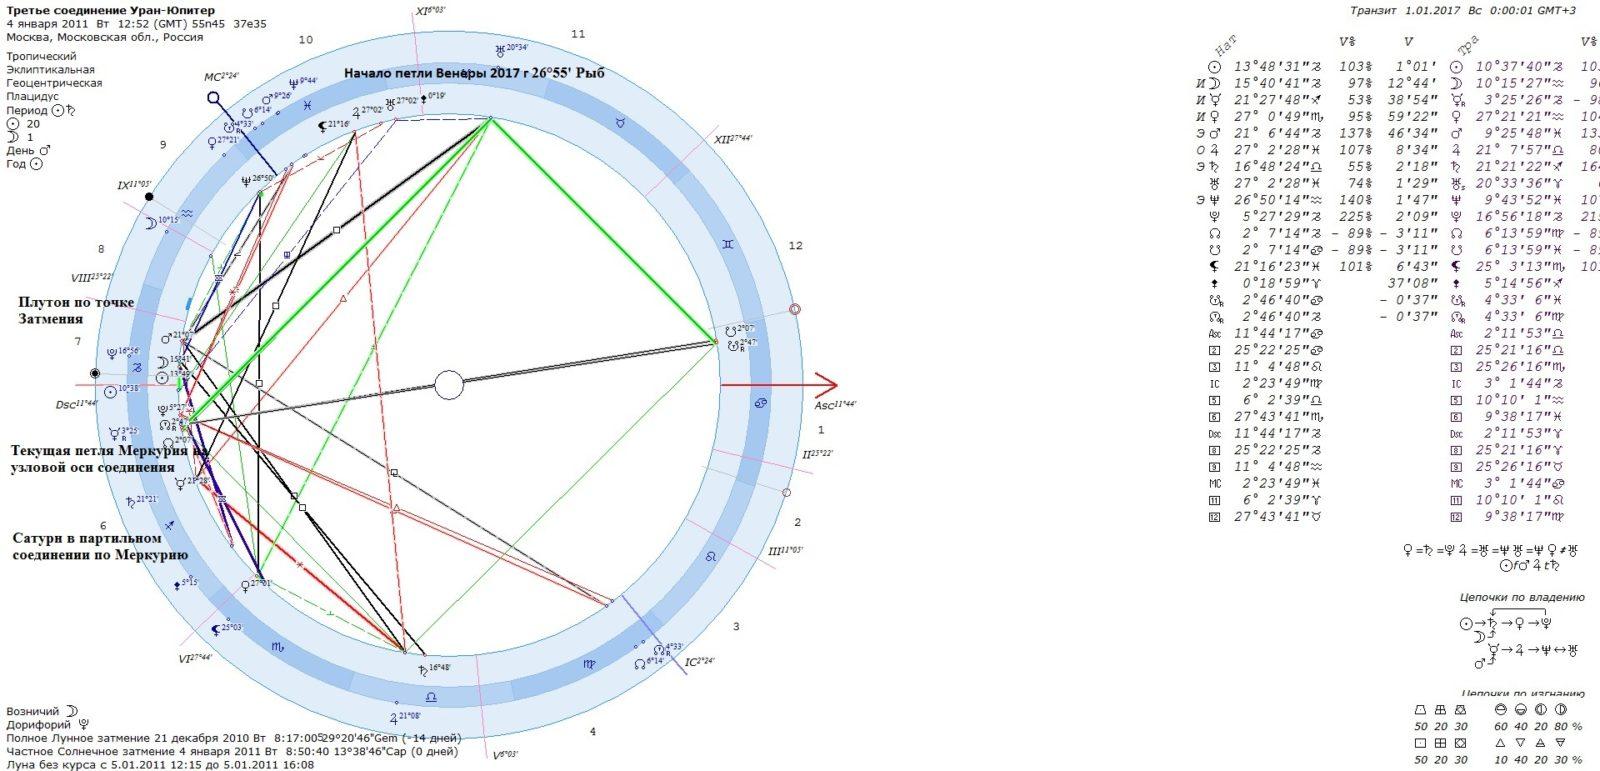 соединение Уран Юпитер - Тау-квадрат Юпитер-Плутон-Уран - главный игрок 2017 года